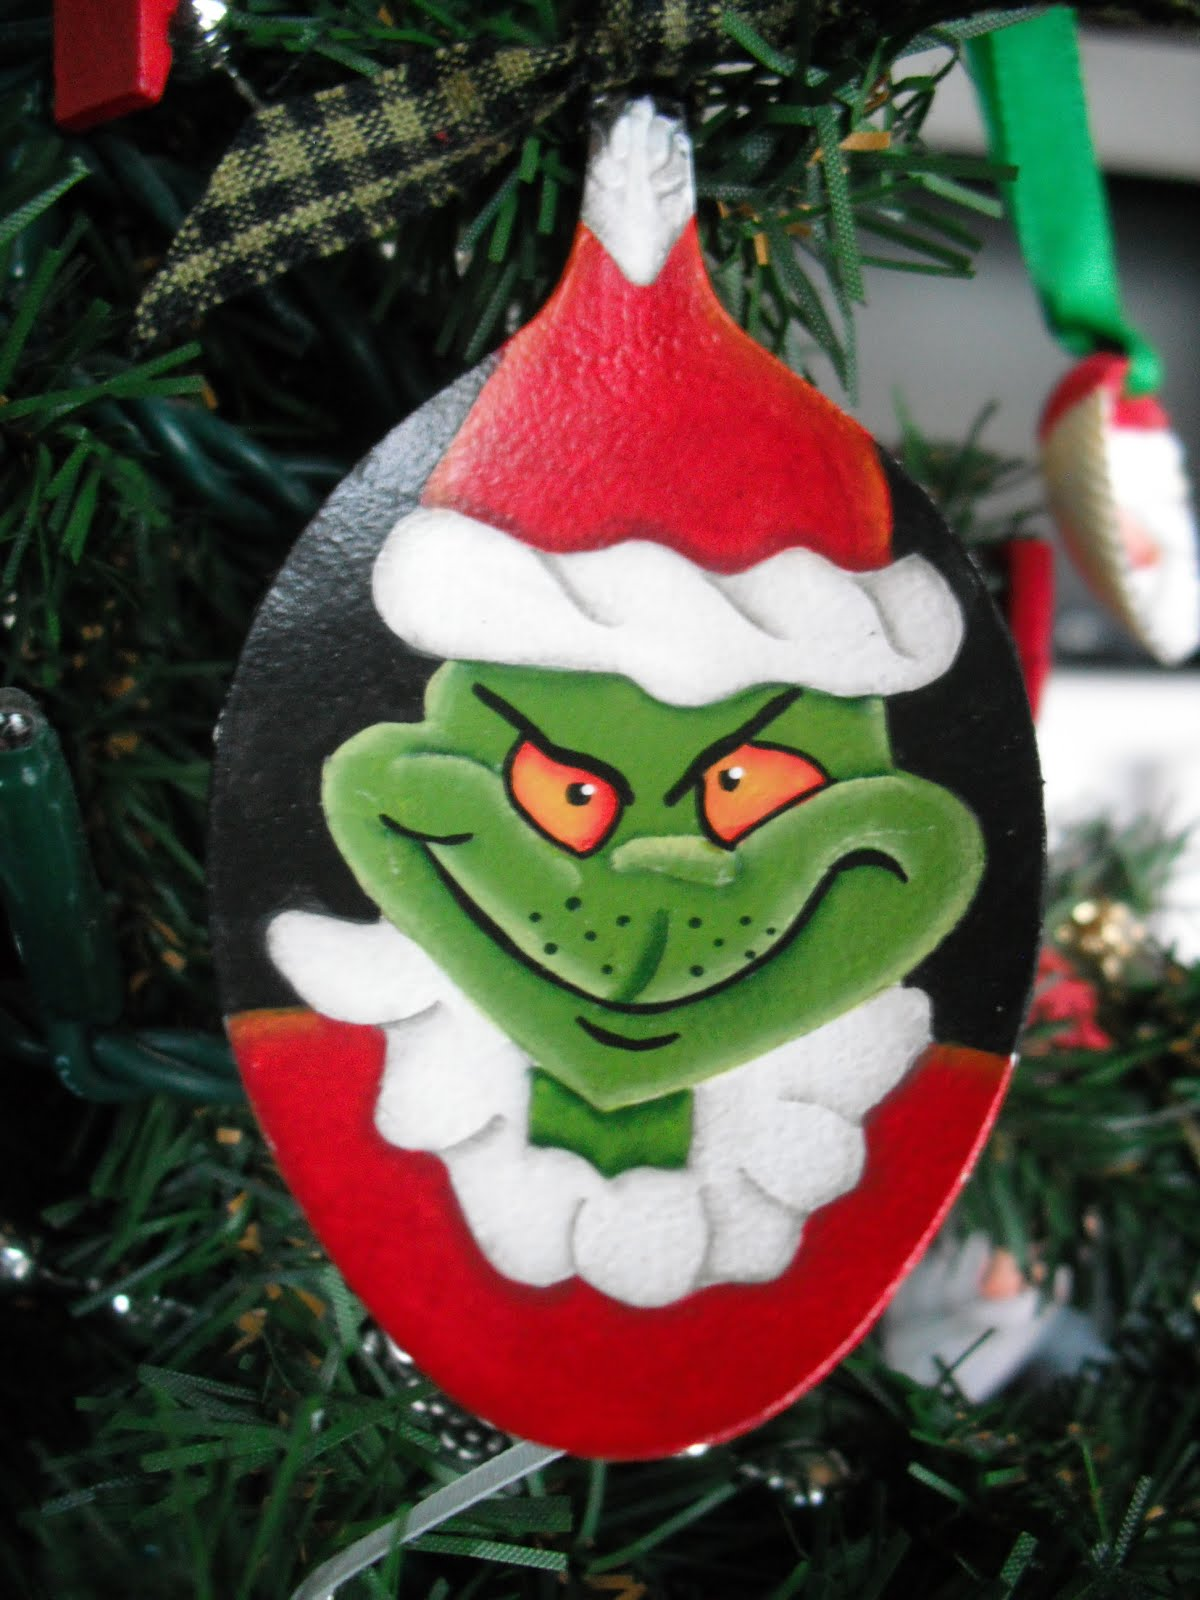 Cyndimac's Nick Knacks: Grinch Spoon Ornaments